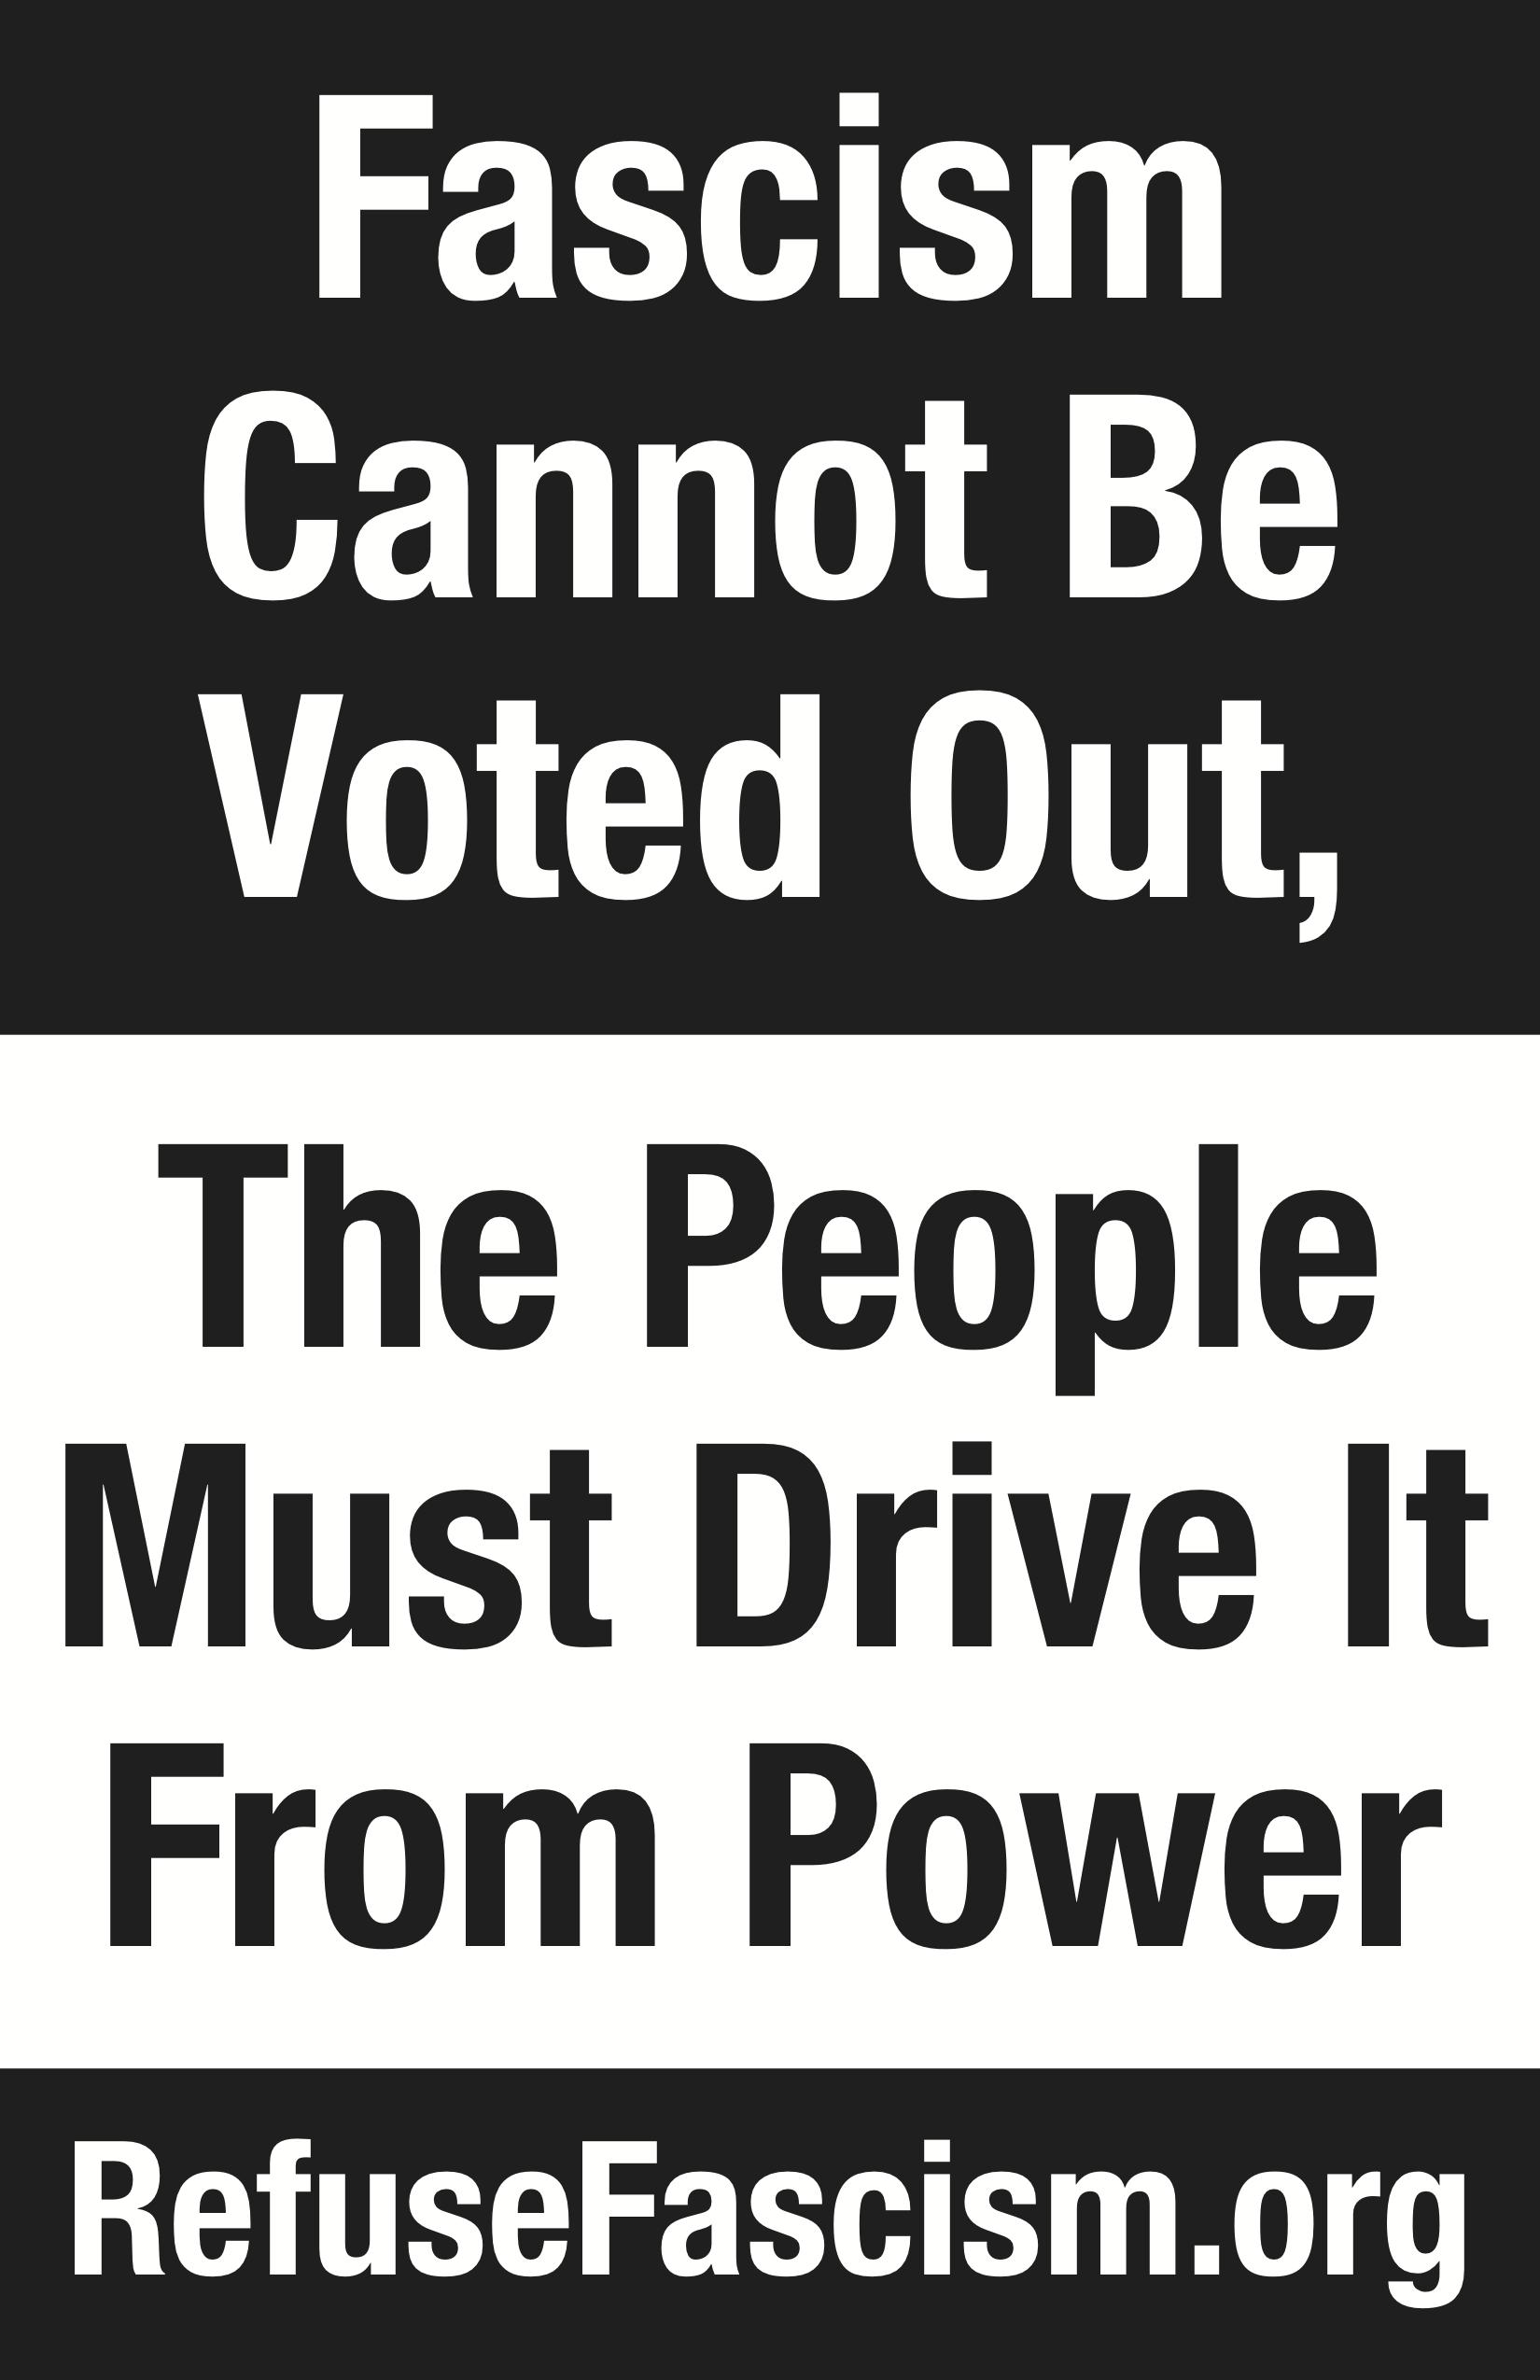 https://refusefascism.org/wp-content/uploads/2019/01/Fascism-Cannot-194x300.png